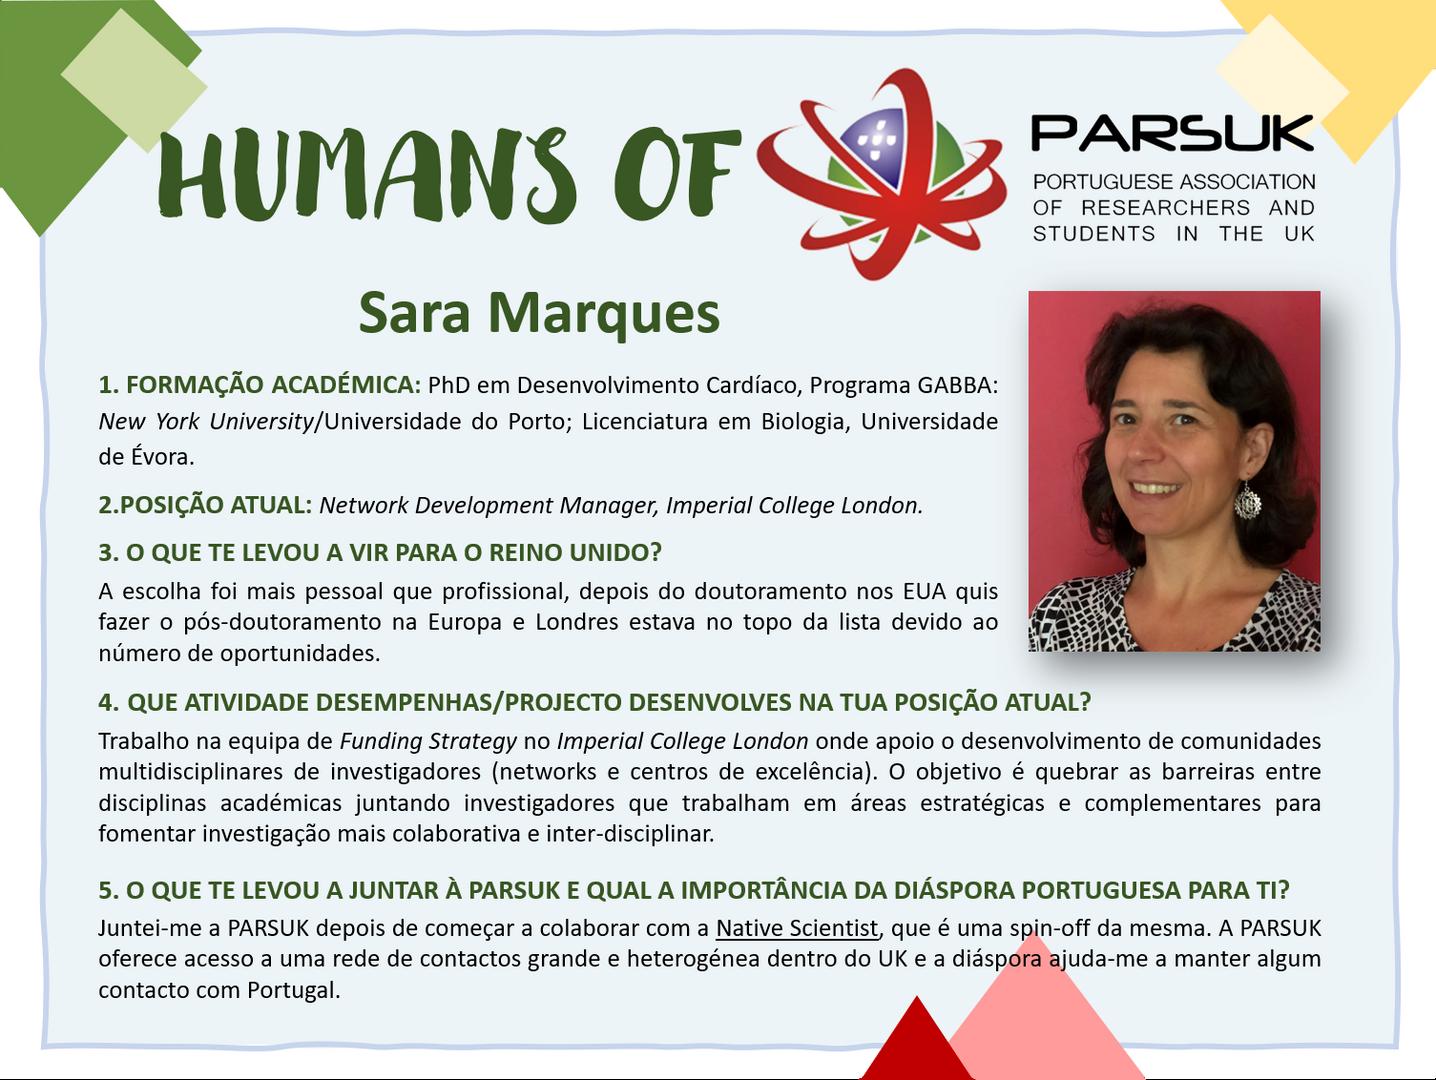 25.Sara Marques.png